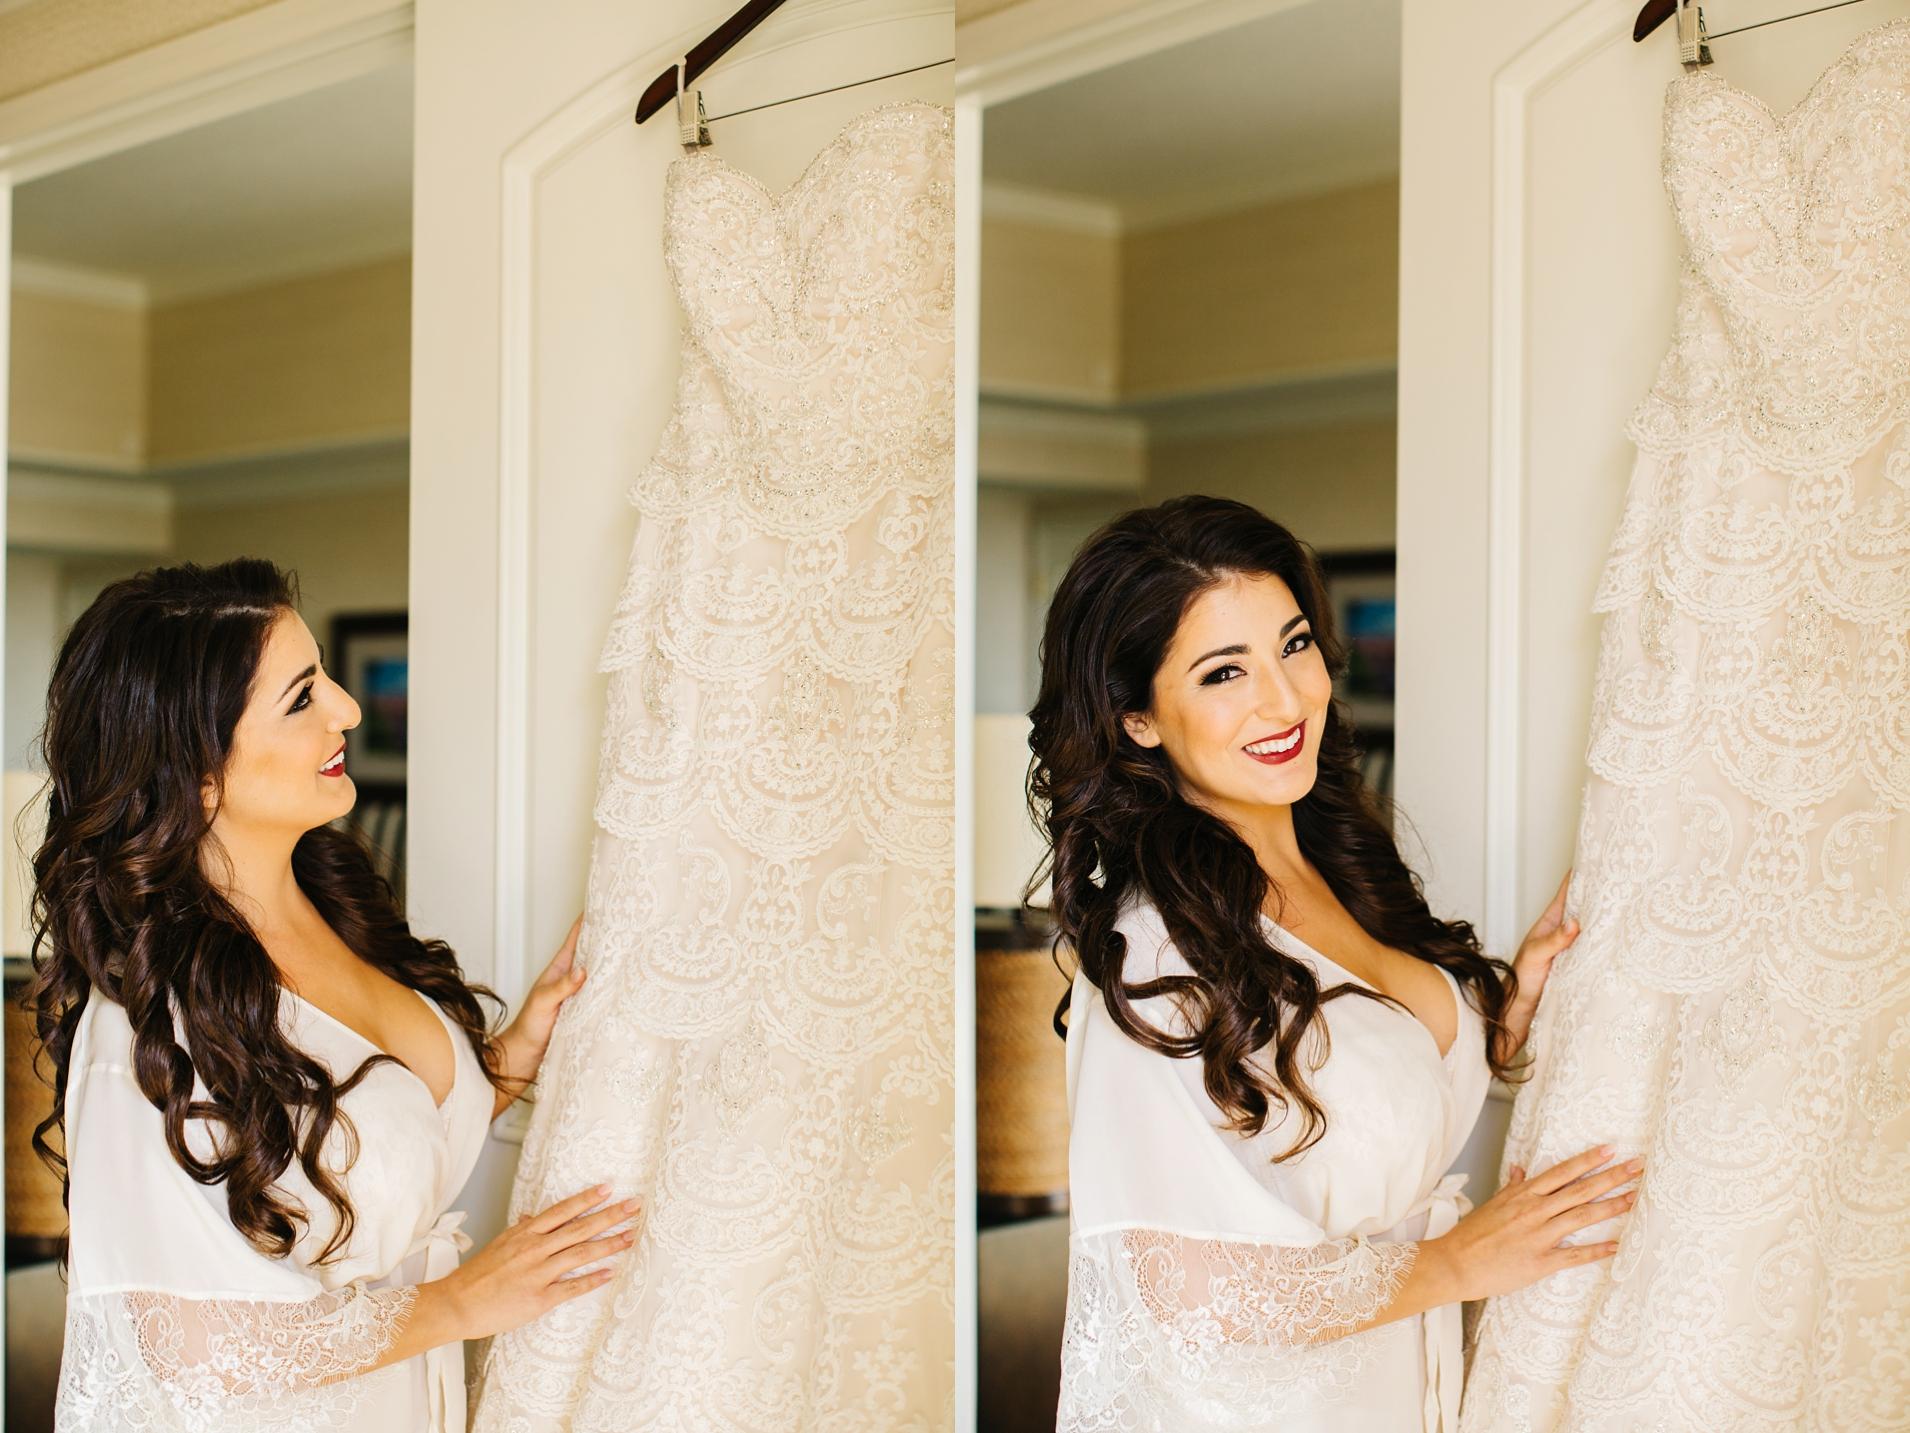 Bride and Wedding Dress - Huntington Beach, CA